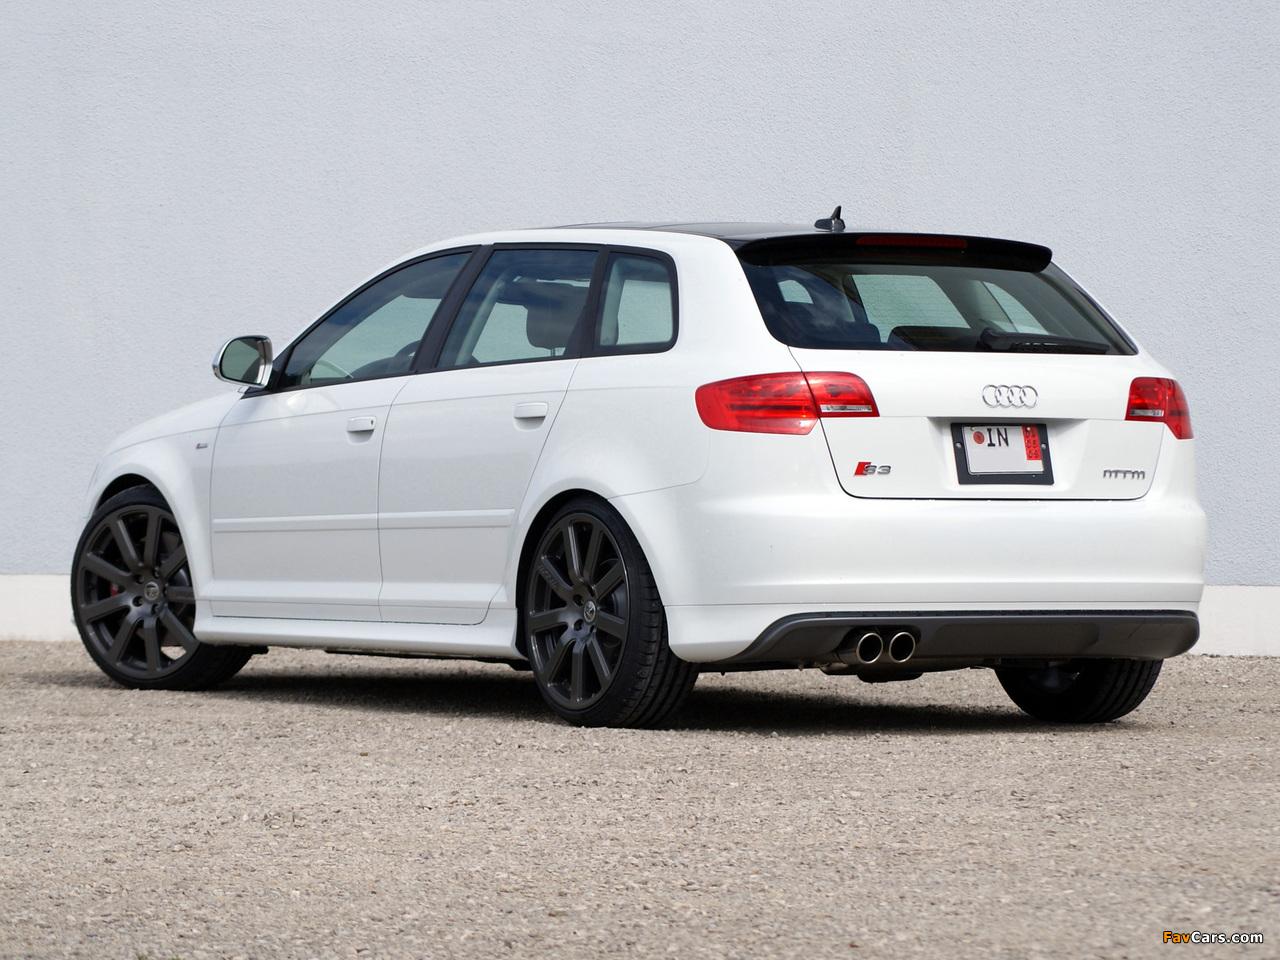 MTM Audi S3 Sportback (8PA) 2009–10 wallpapers (1280x960)